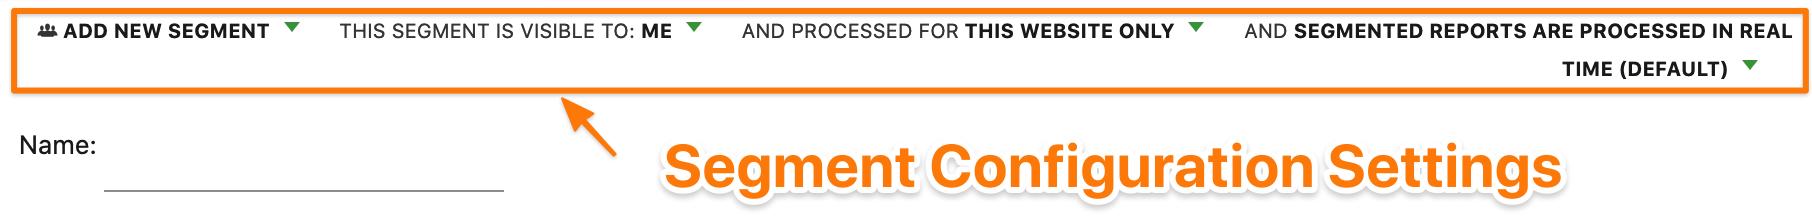 Segment Configuration Settings